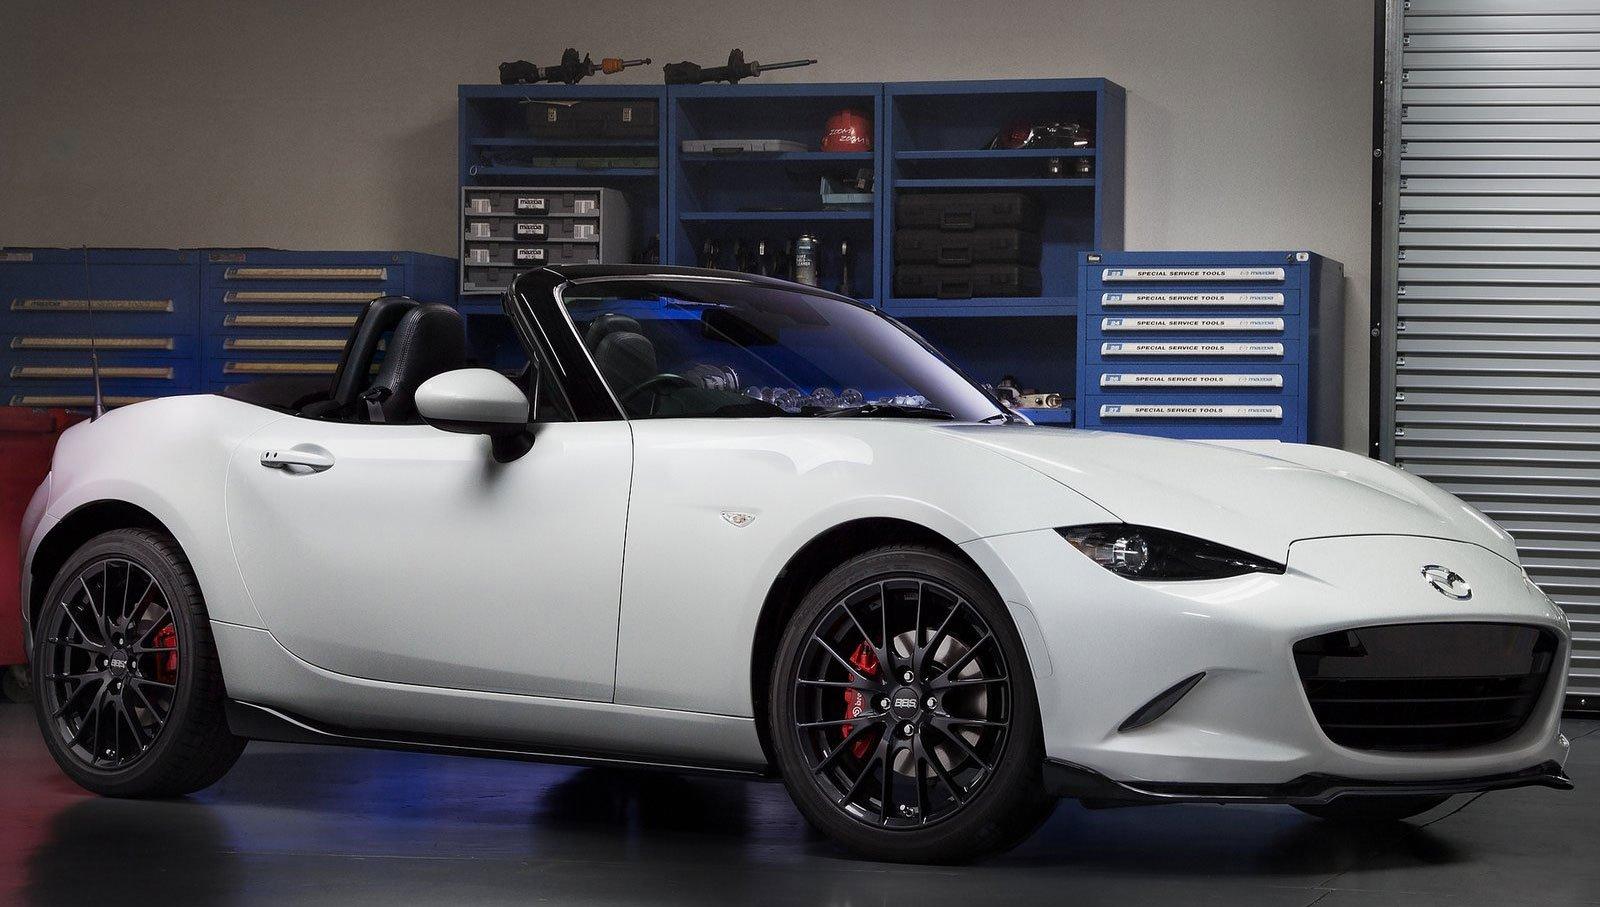 White 2g Eclipse at the Car Show |White Dsm Car